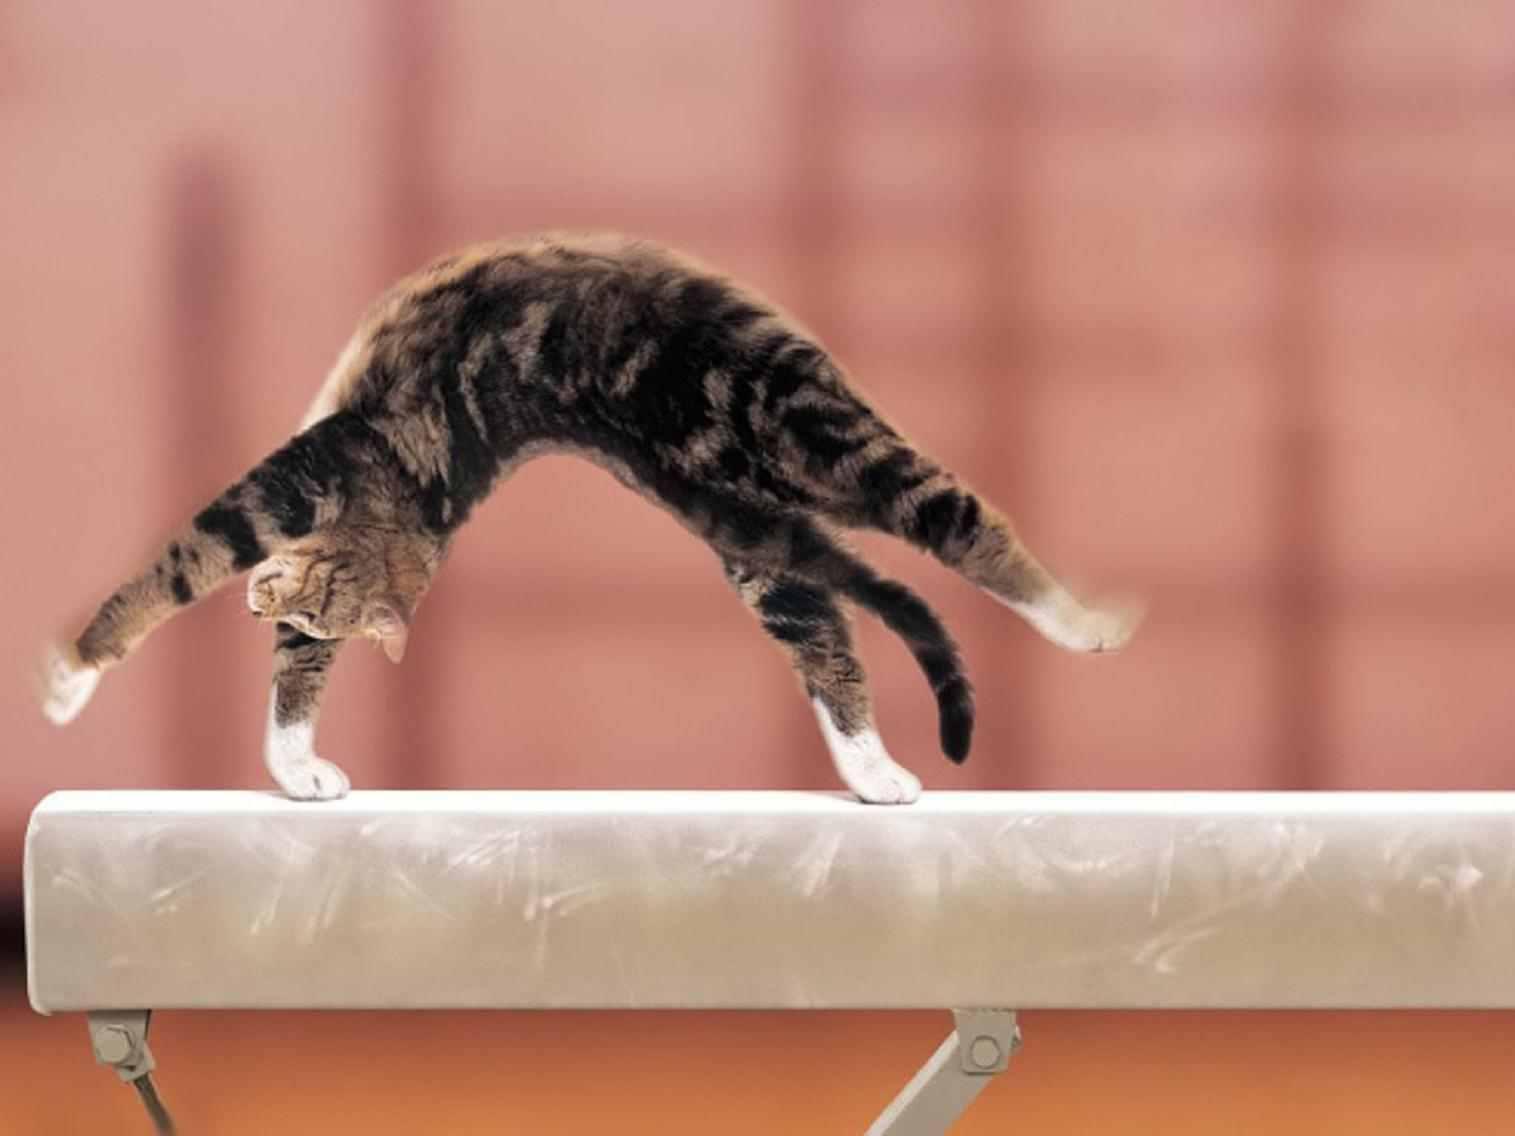 Трюки с котом в домашних условиях